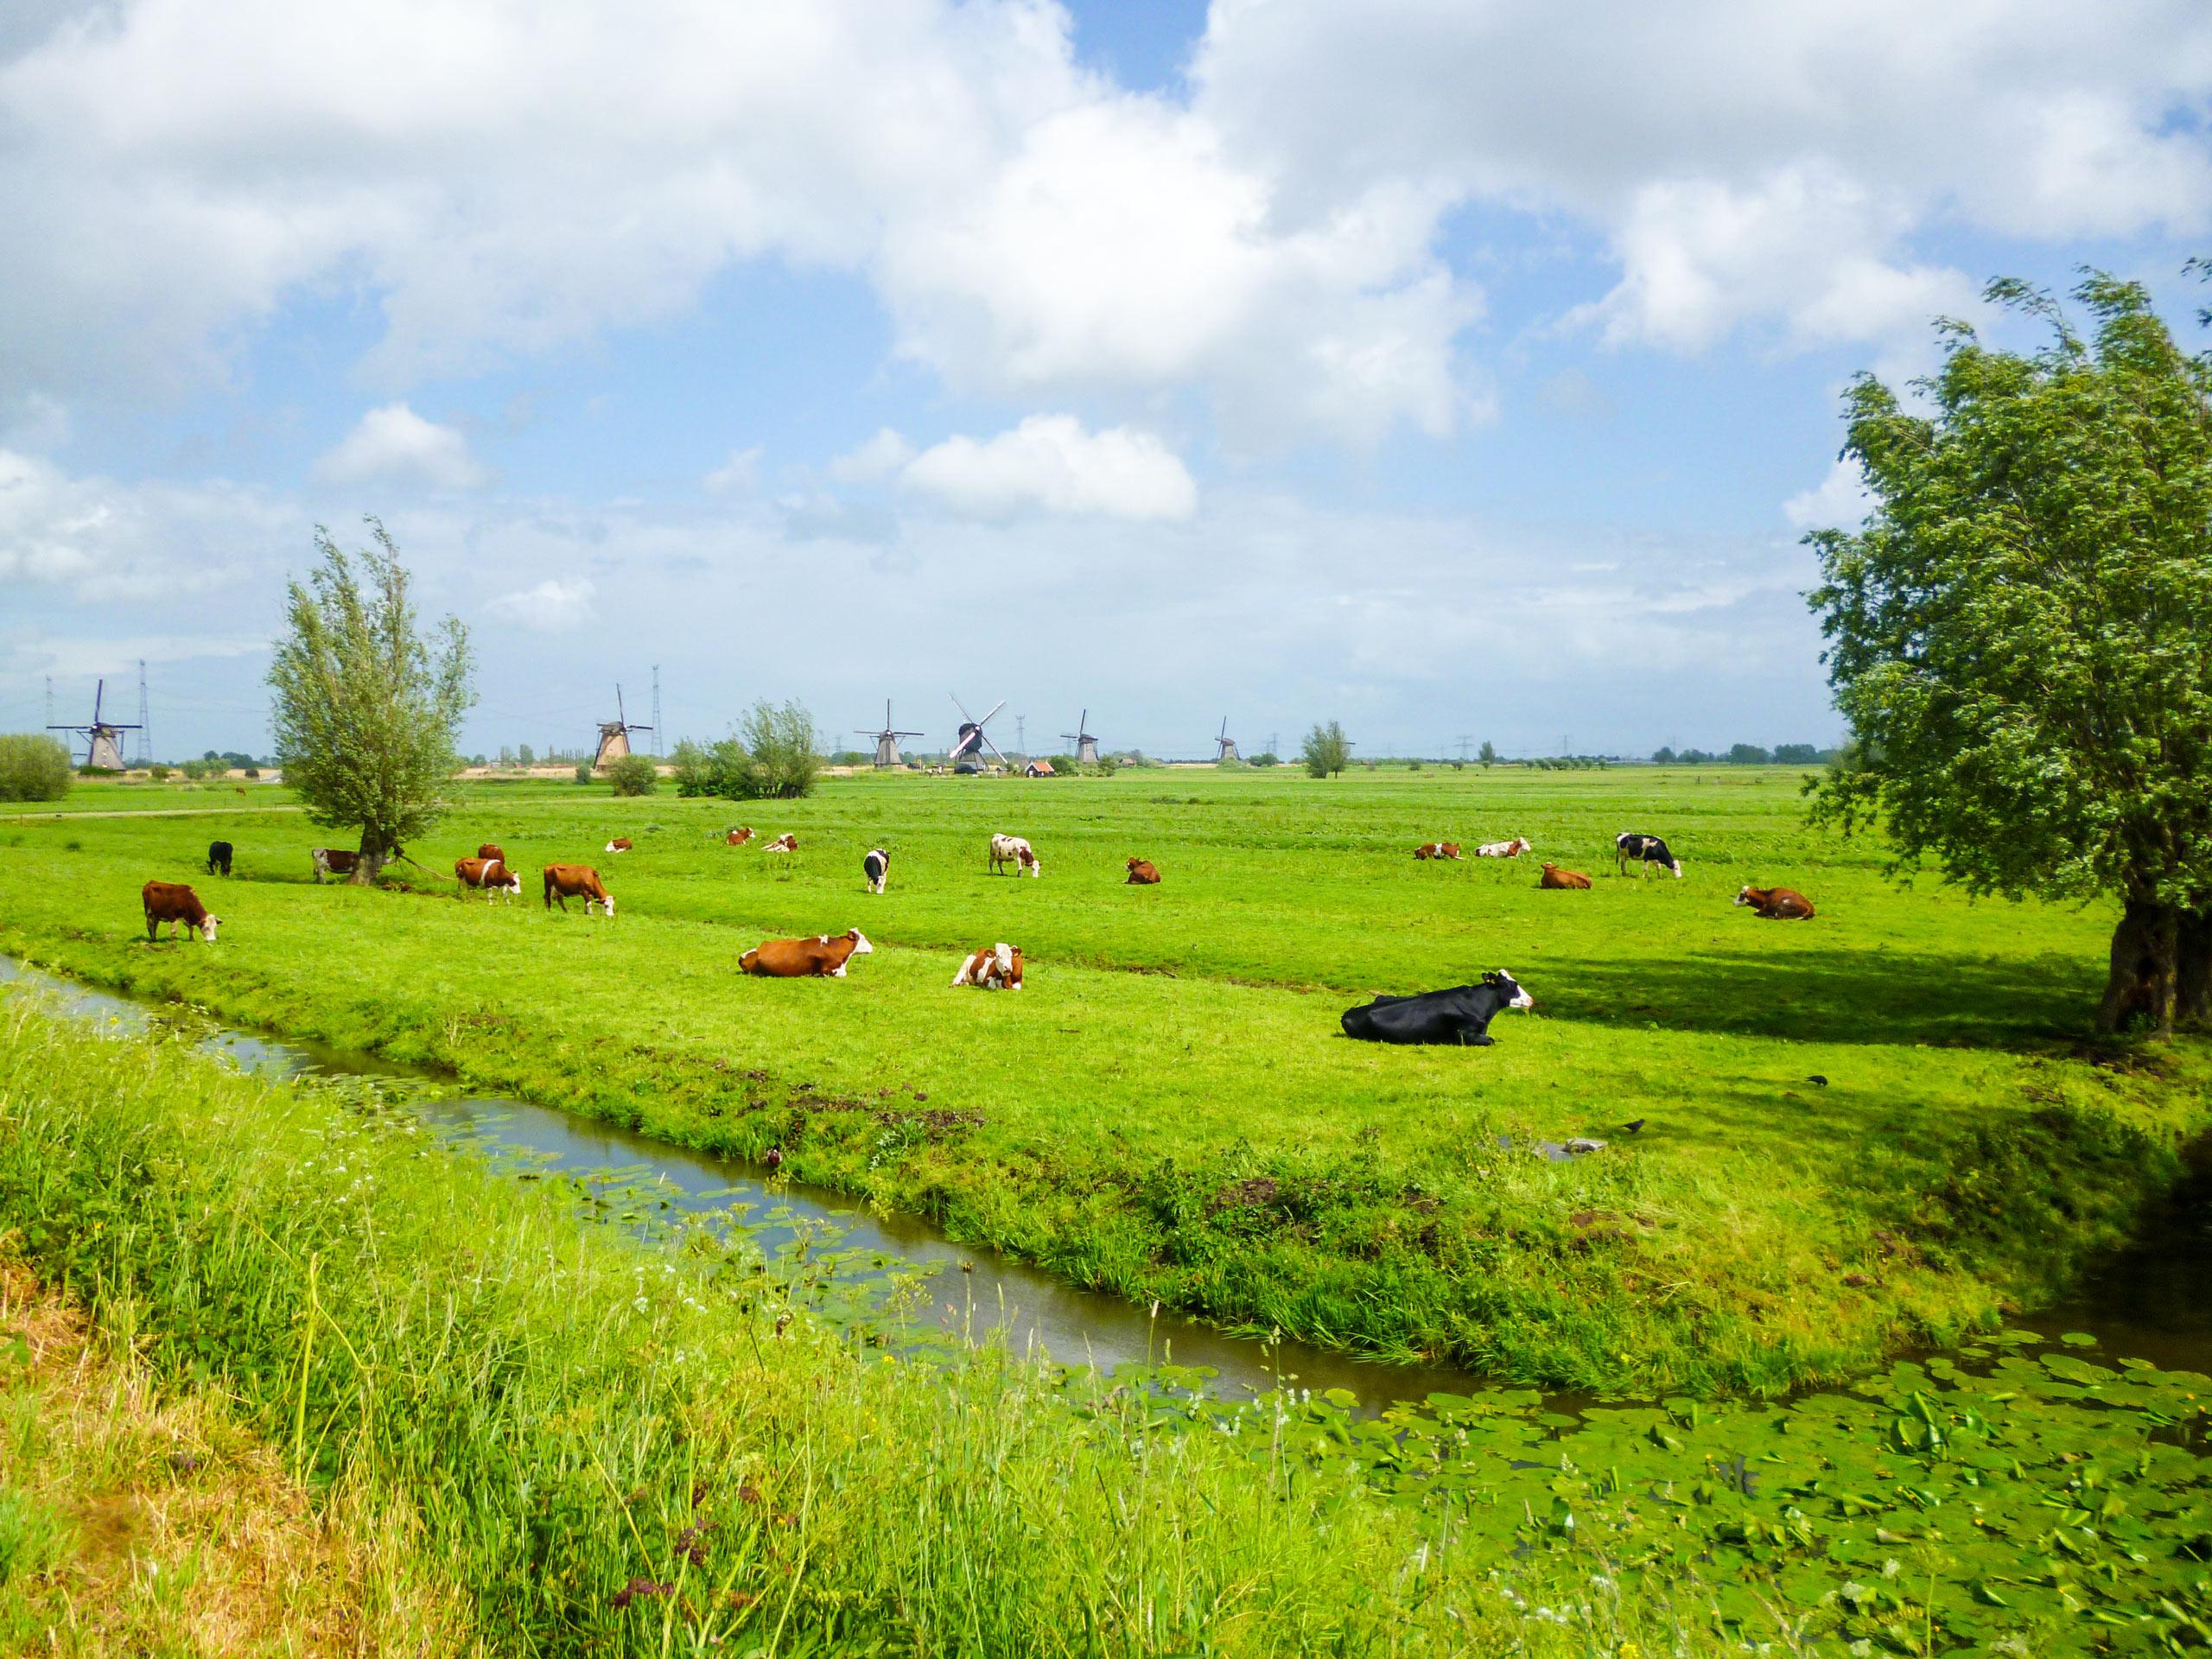 Herd of cows in the field